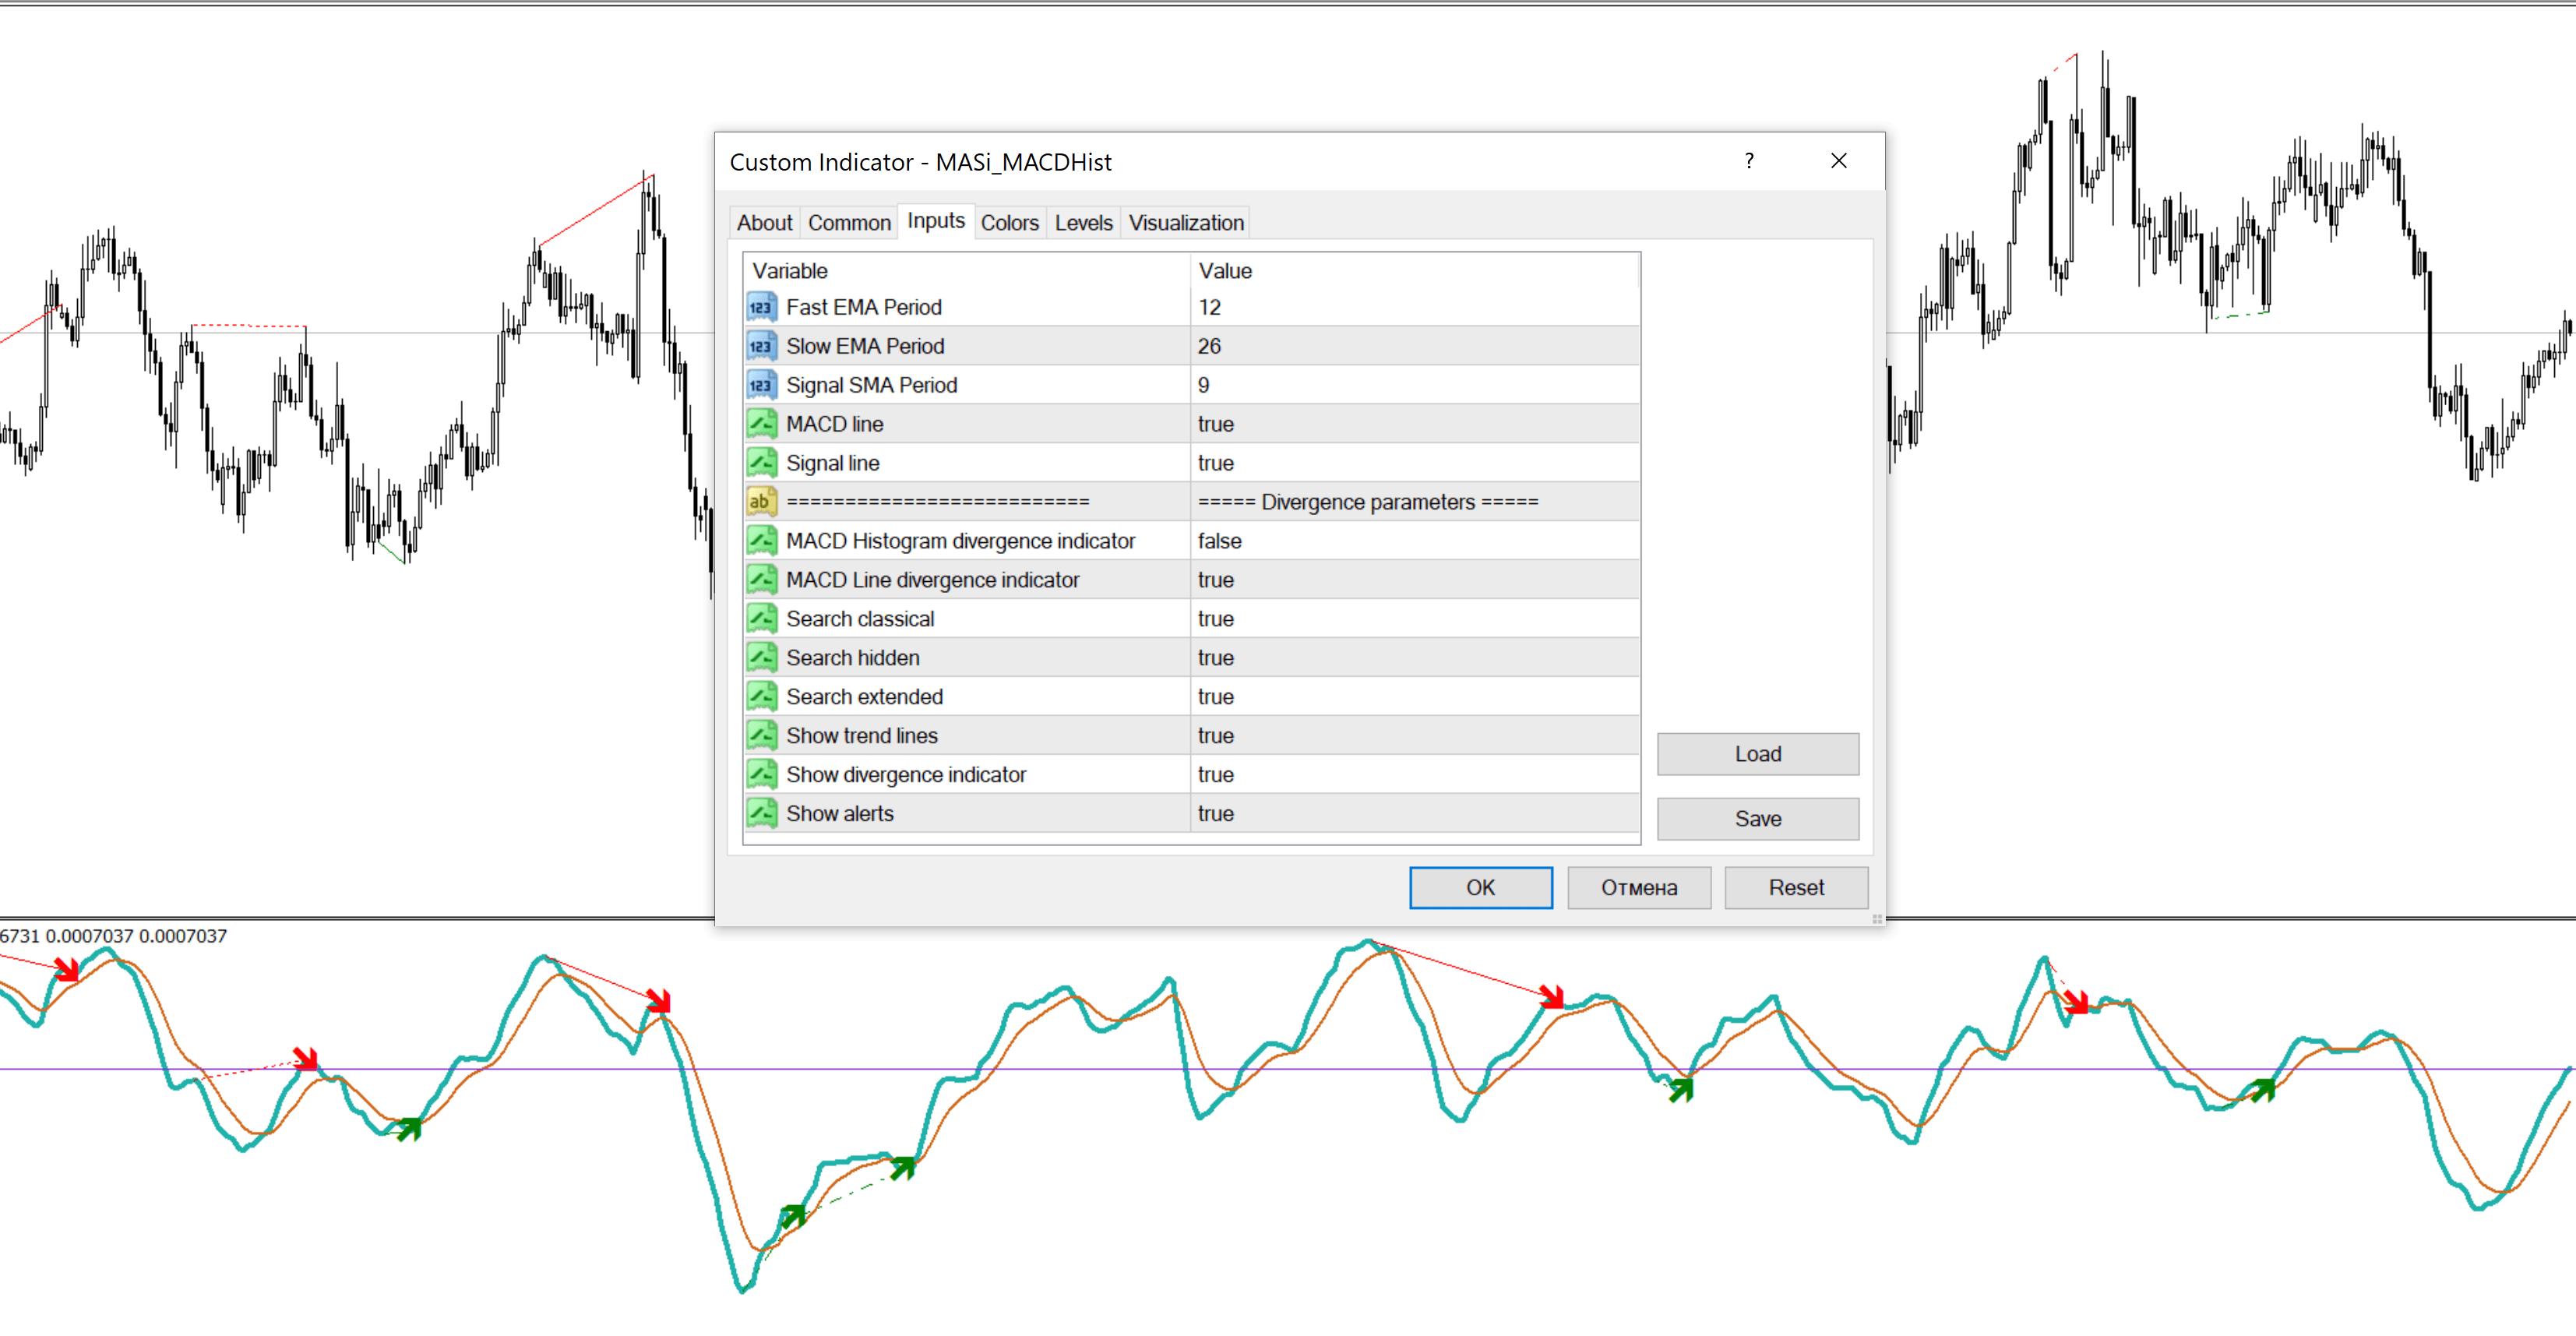 Divergence MACD Histogram Indicator Settings